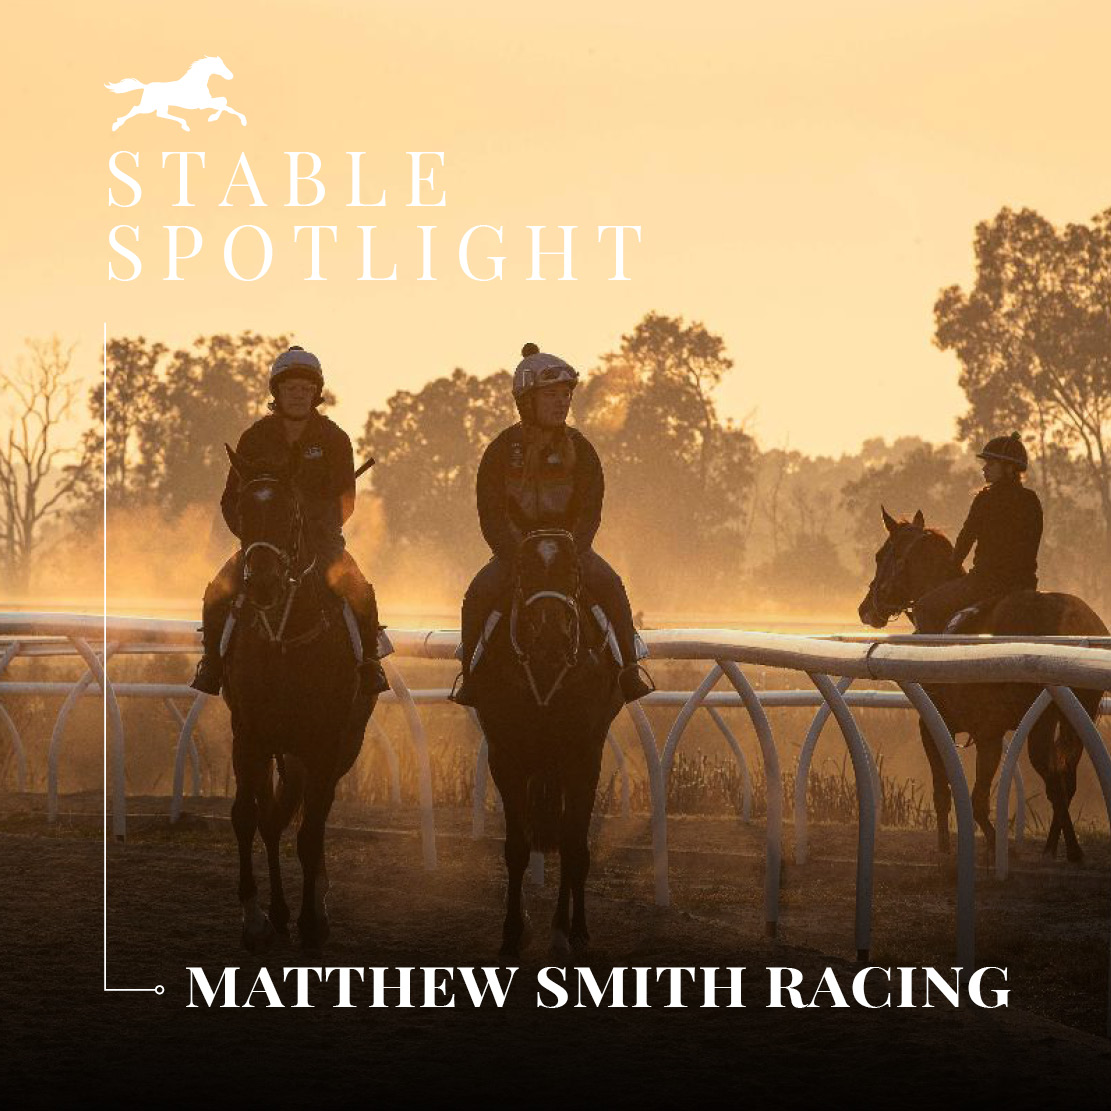 Stable Spotlight – Matthew Smith Racing